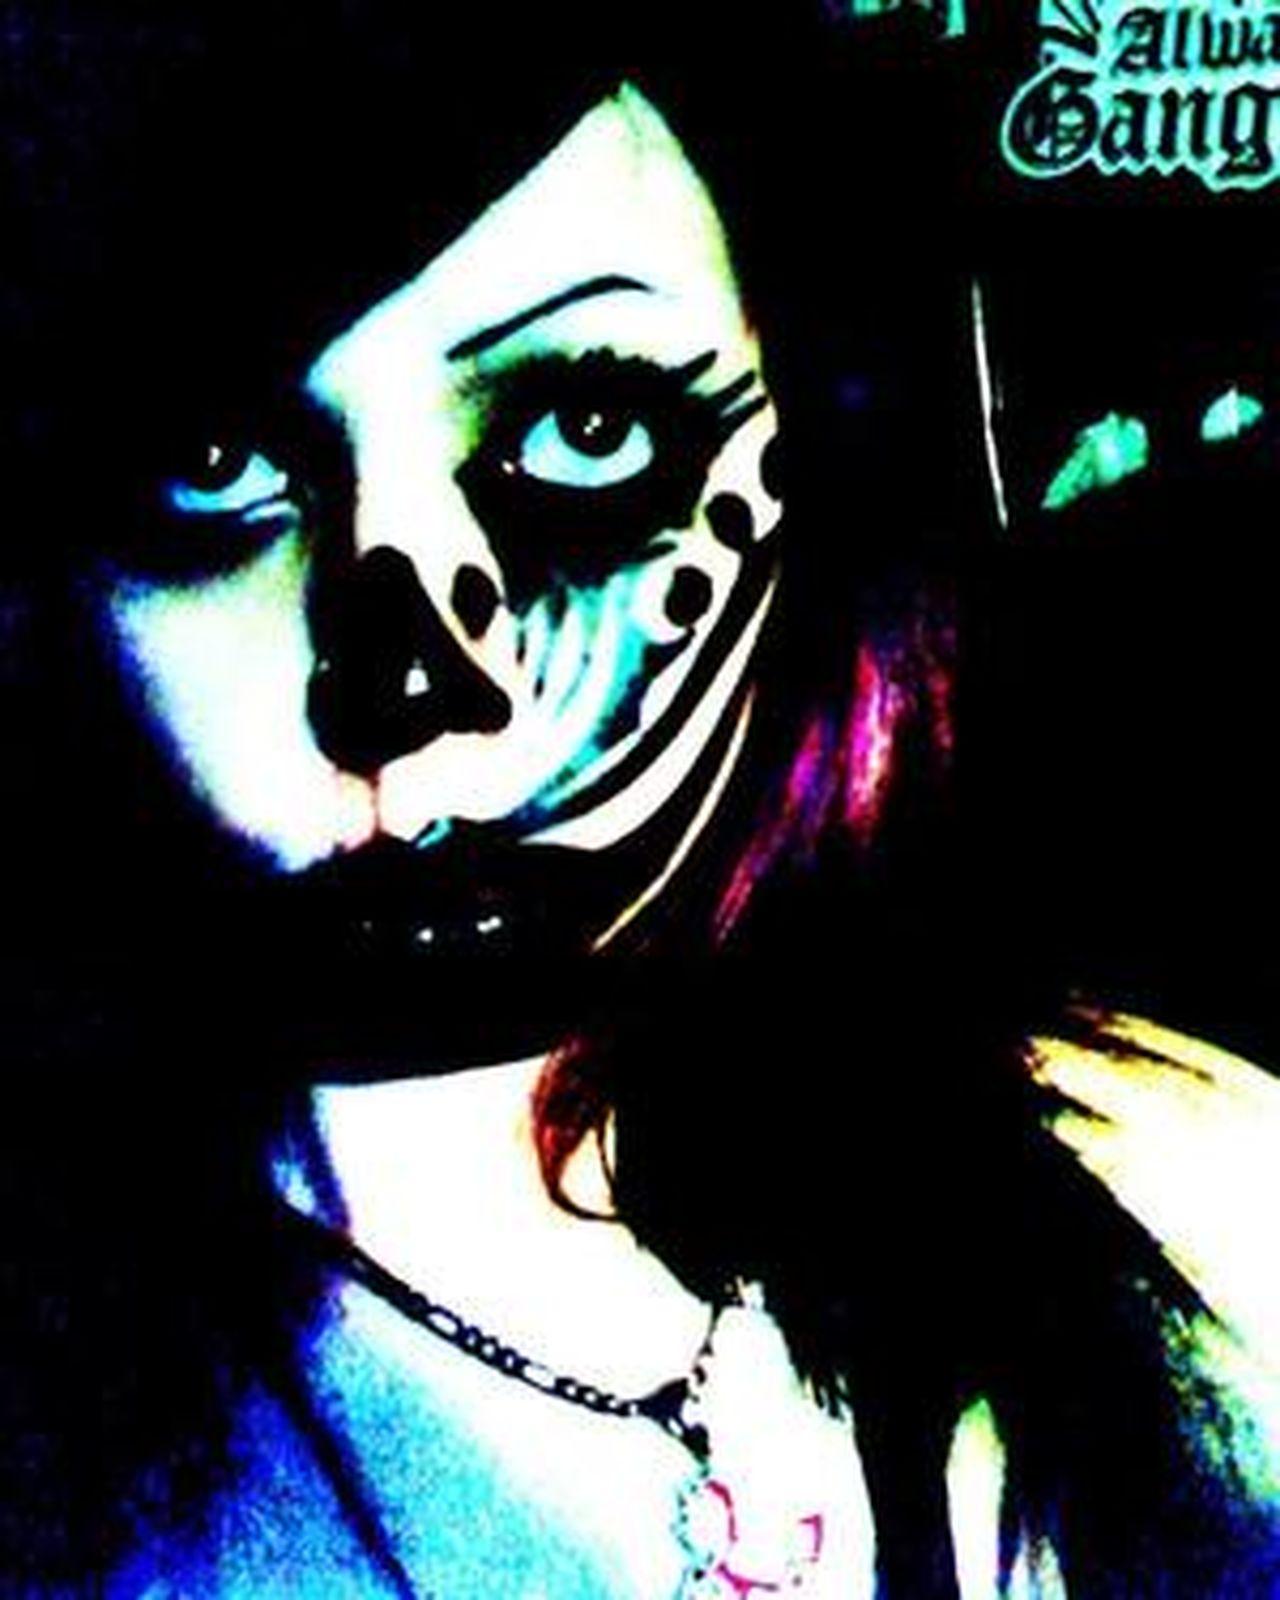 Colors Of Carnival Juggalette Juggalo Pride Hatchetgirl Juggalo Dark Carnival Whoop Whoop Clownin Wicked Clowns Facepaint Picturing Individuality